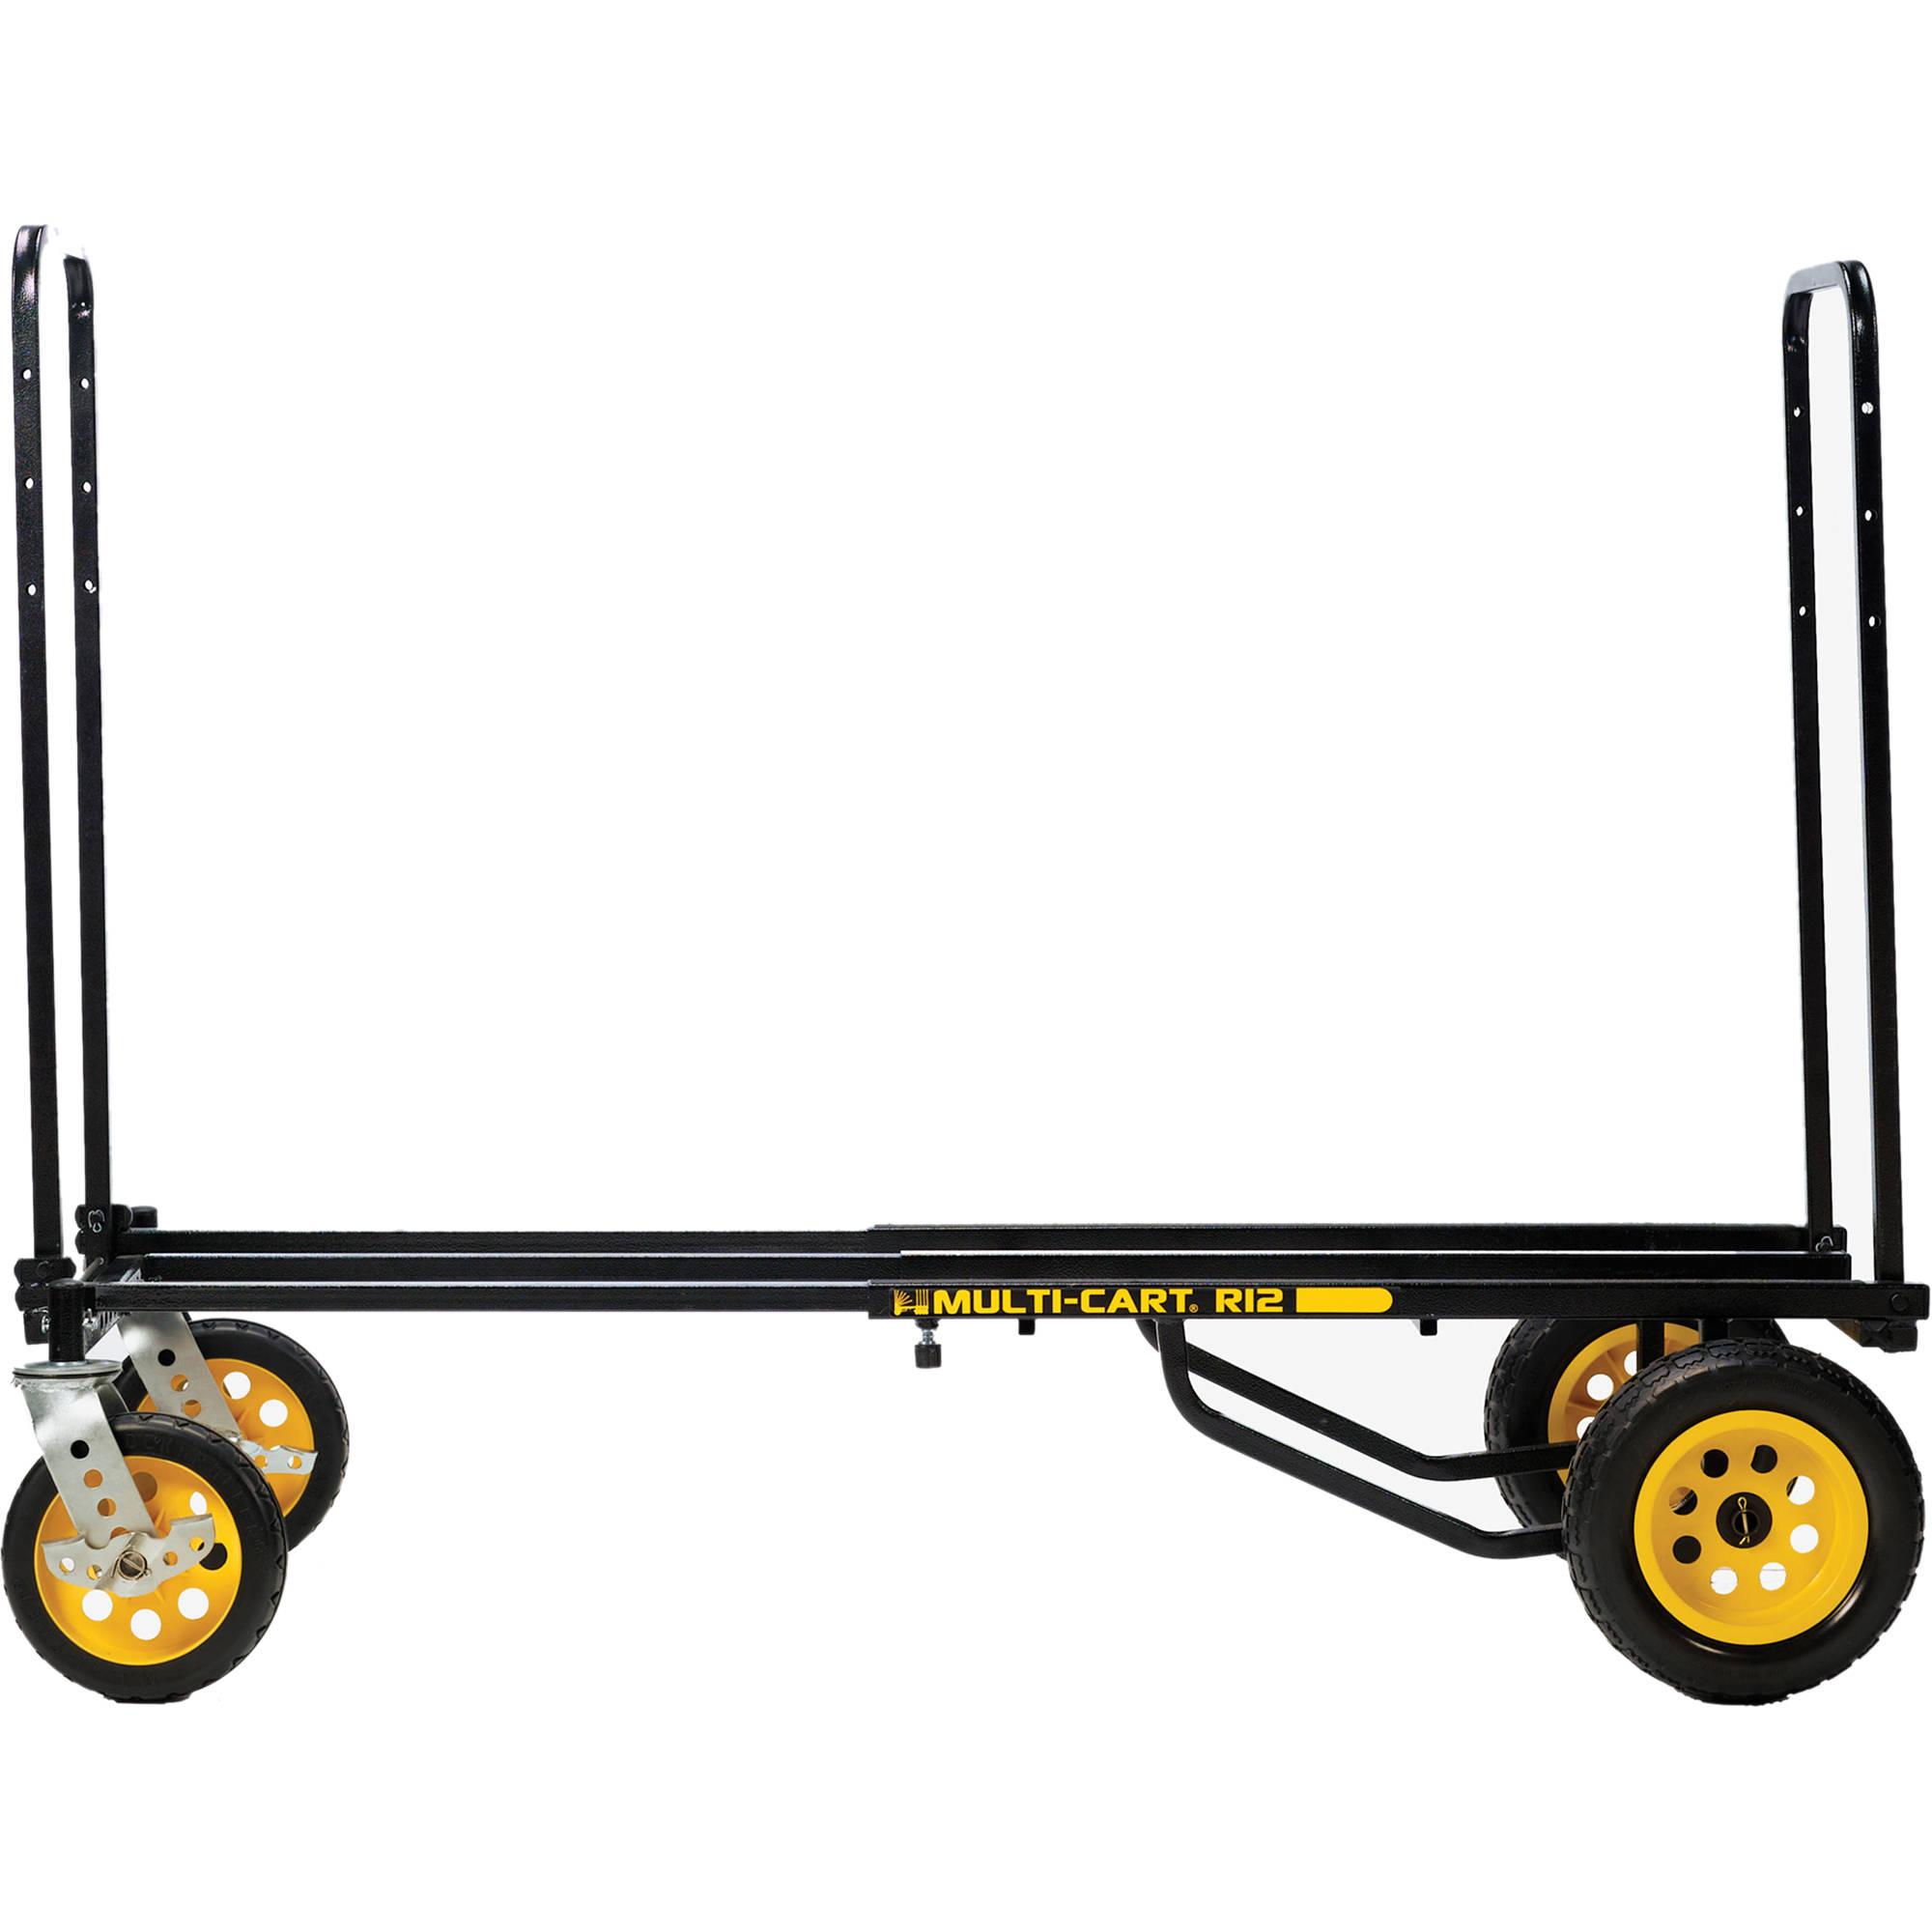 Multicart Rocknroller R12rt 8 In 1 All Terrain Equipment R12rt